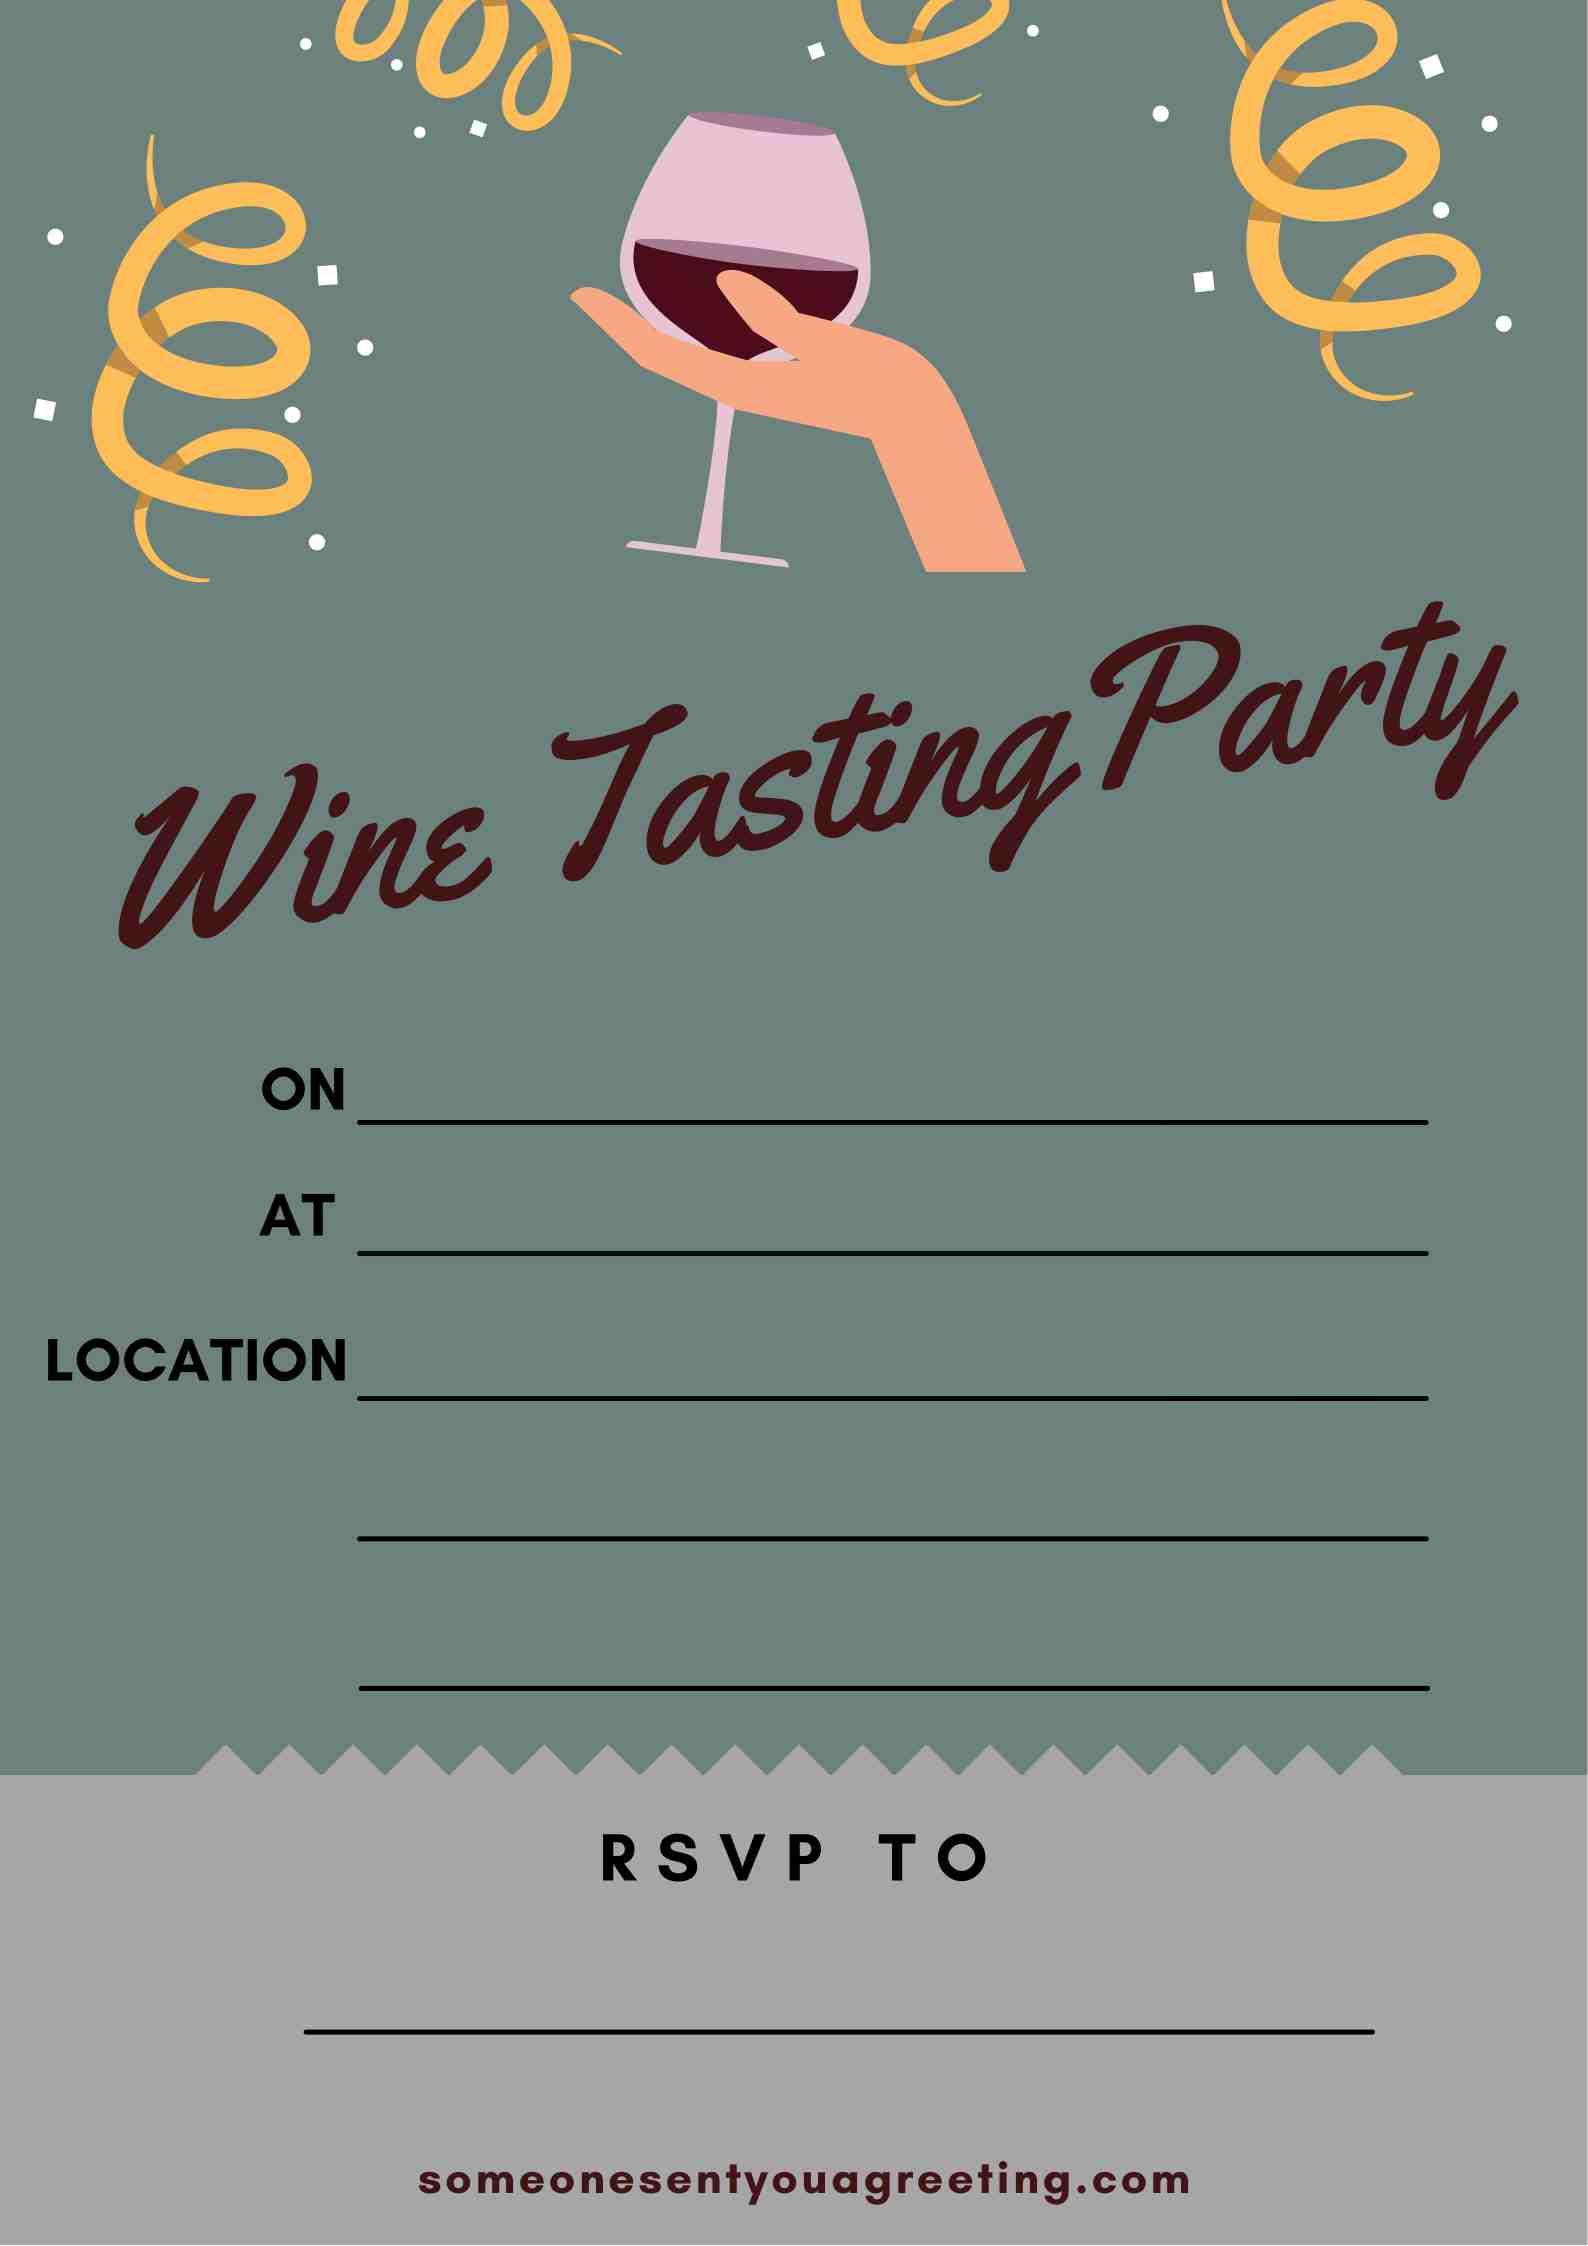 printable wine tasting party invitation example